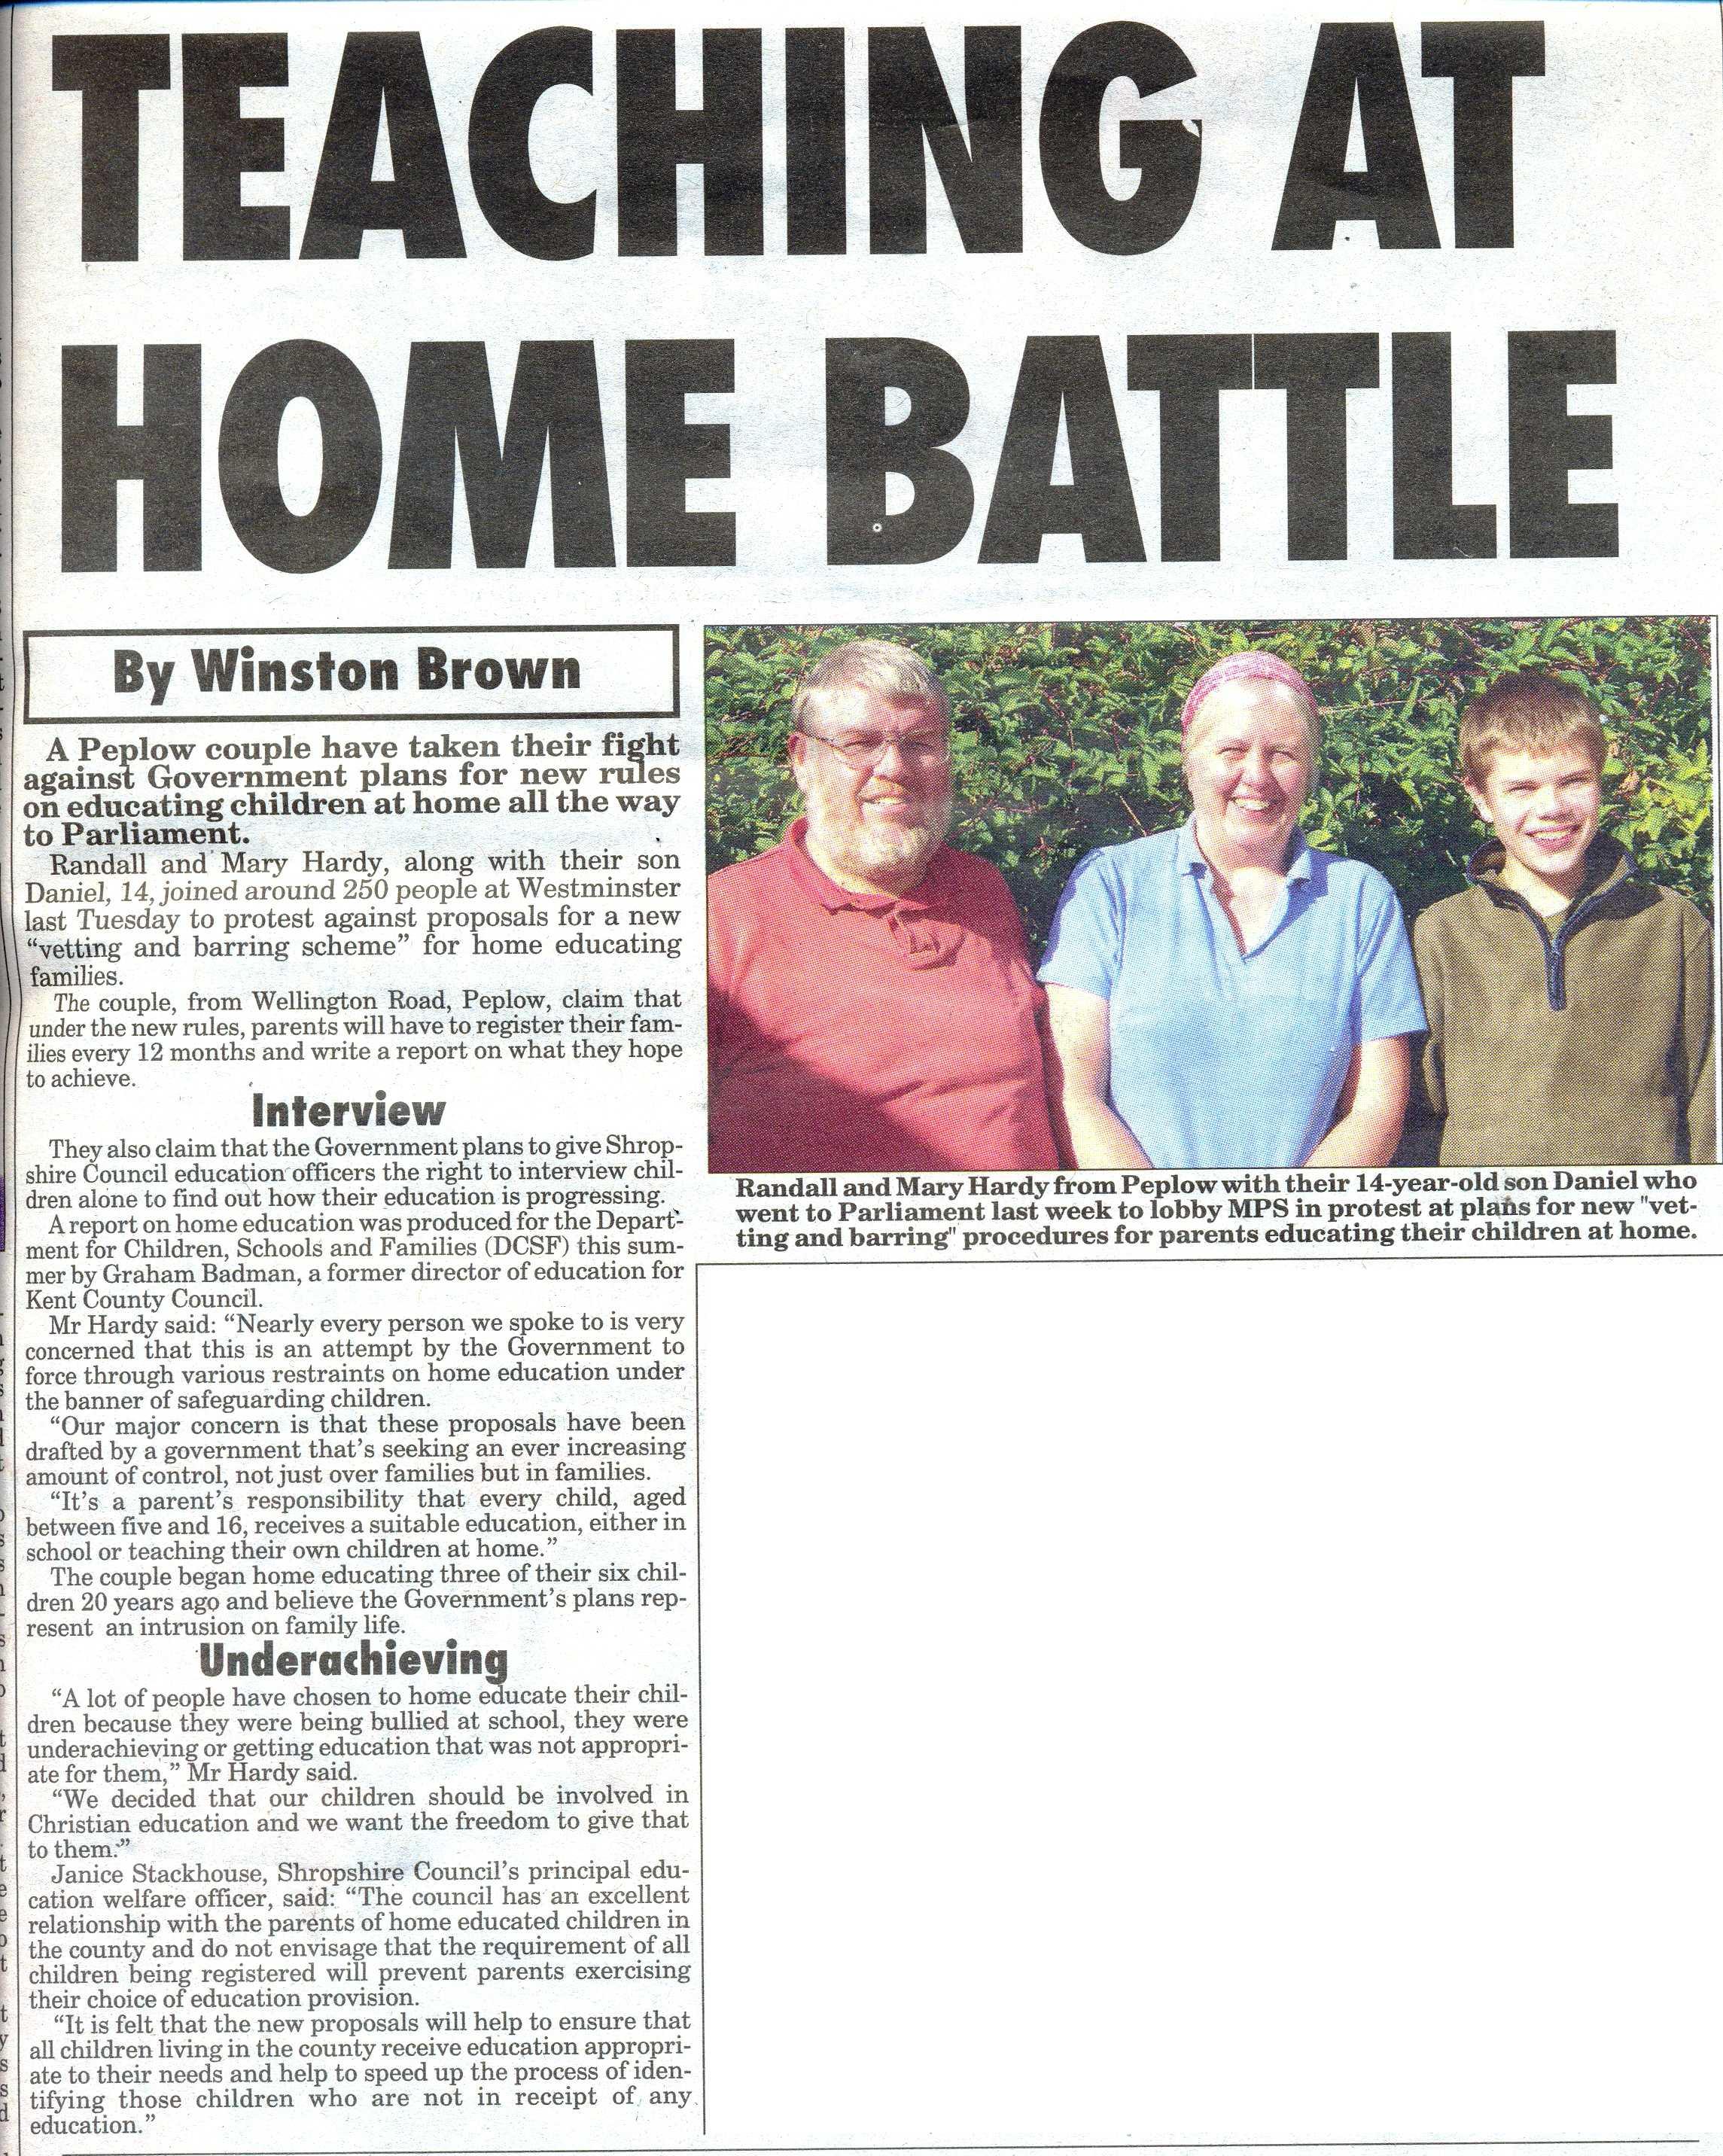 Market Drayton Advertiser - Article 9 October 2009